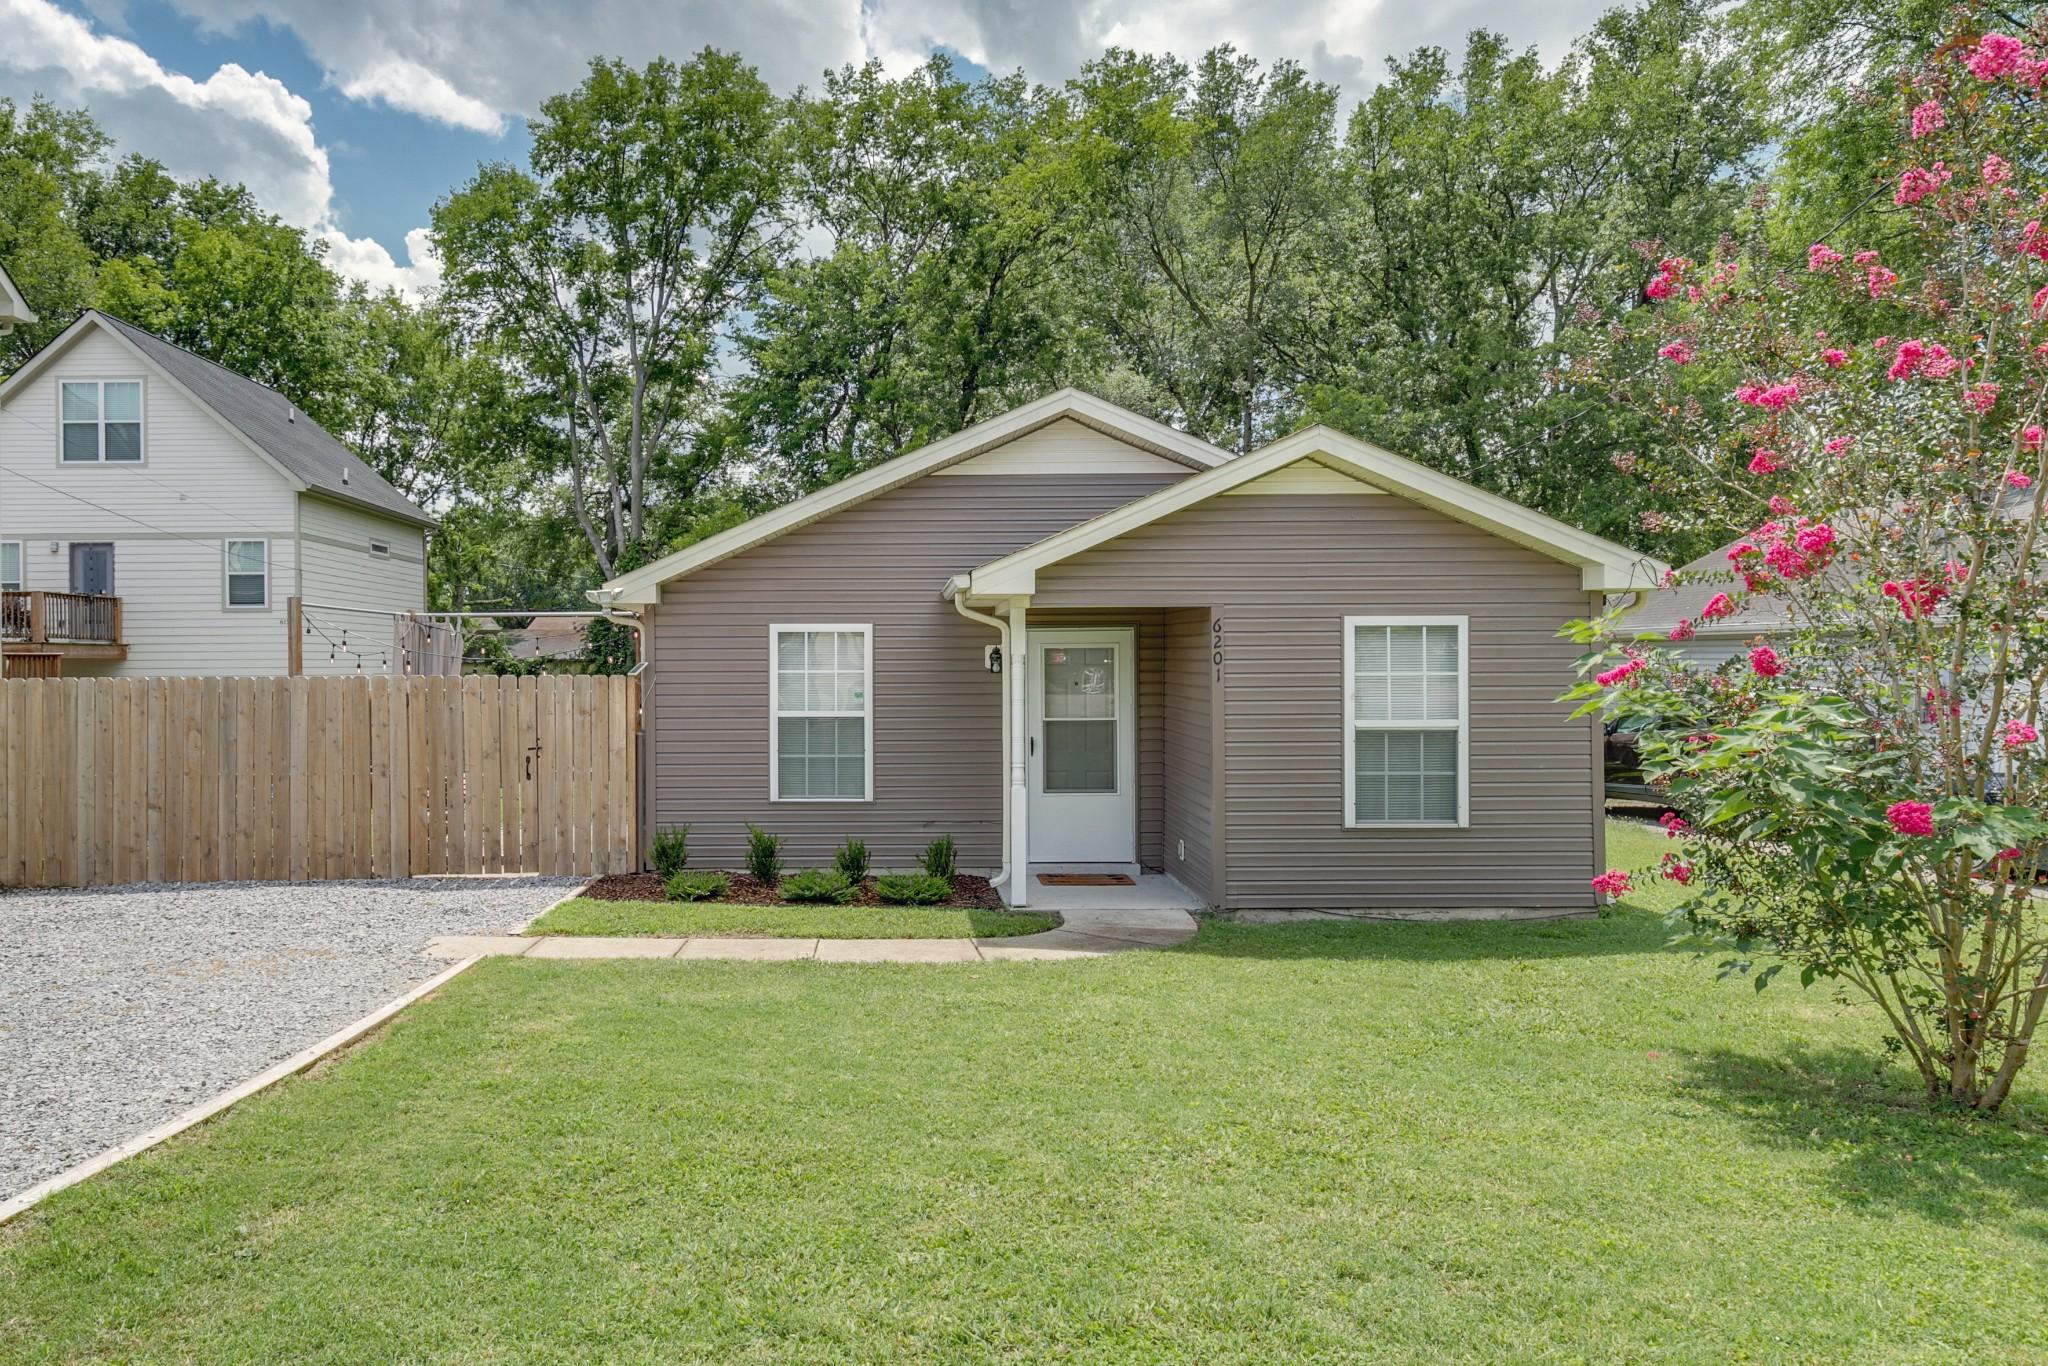 6201 Louisiana Ave Property Photo - Nashville, TN real estate listing